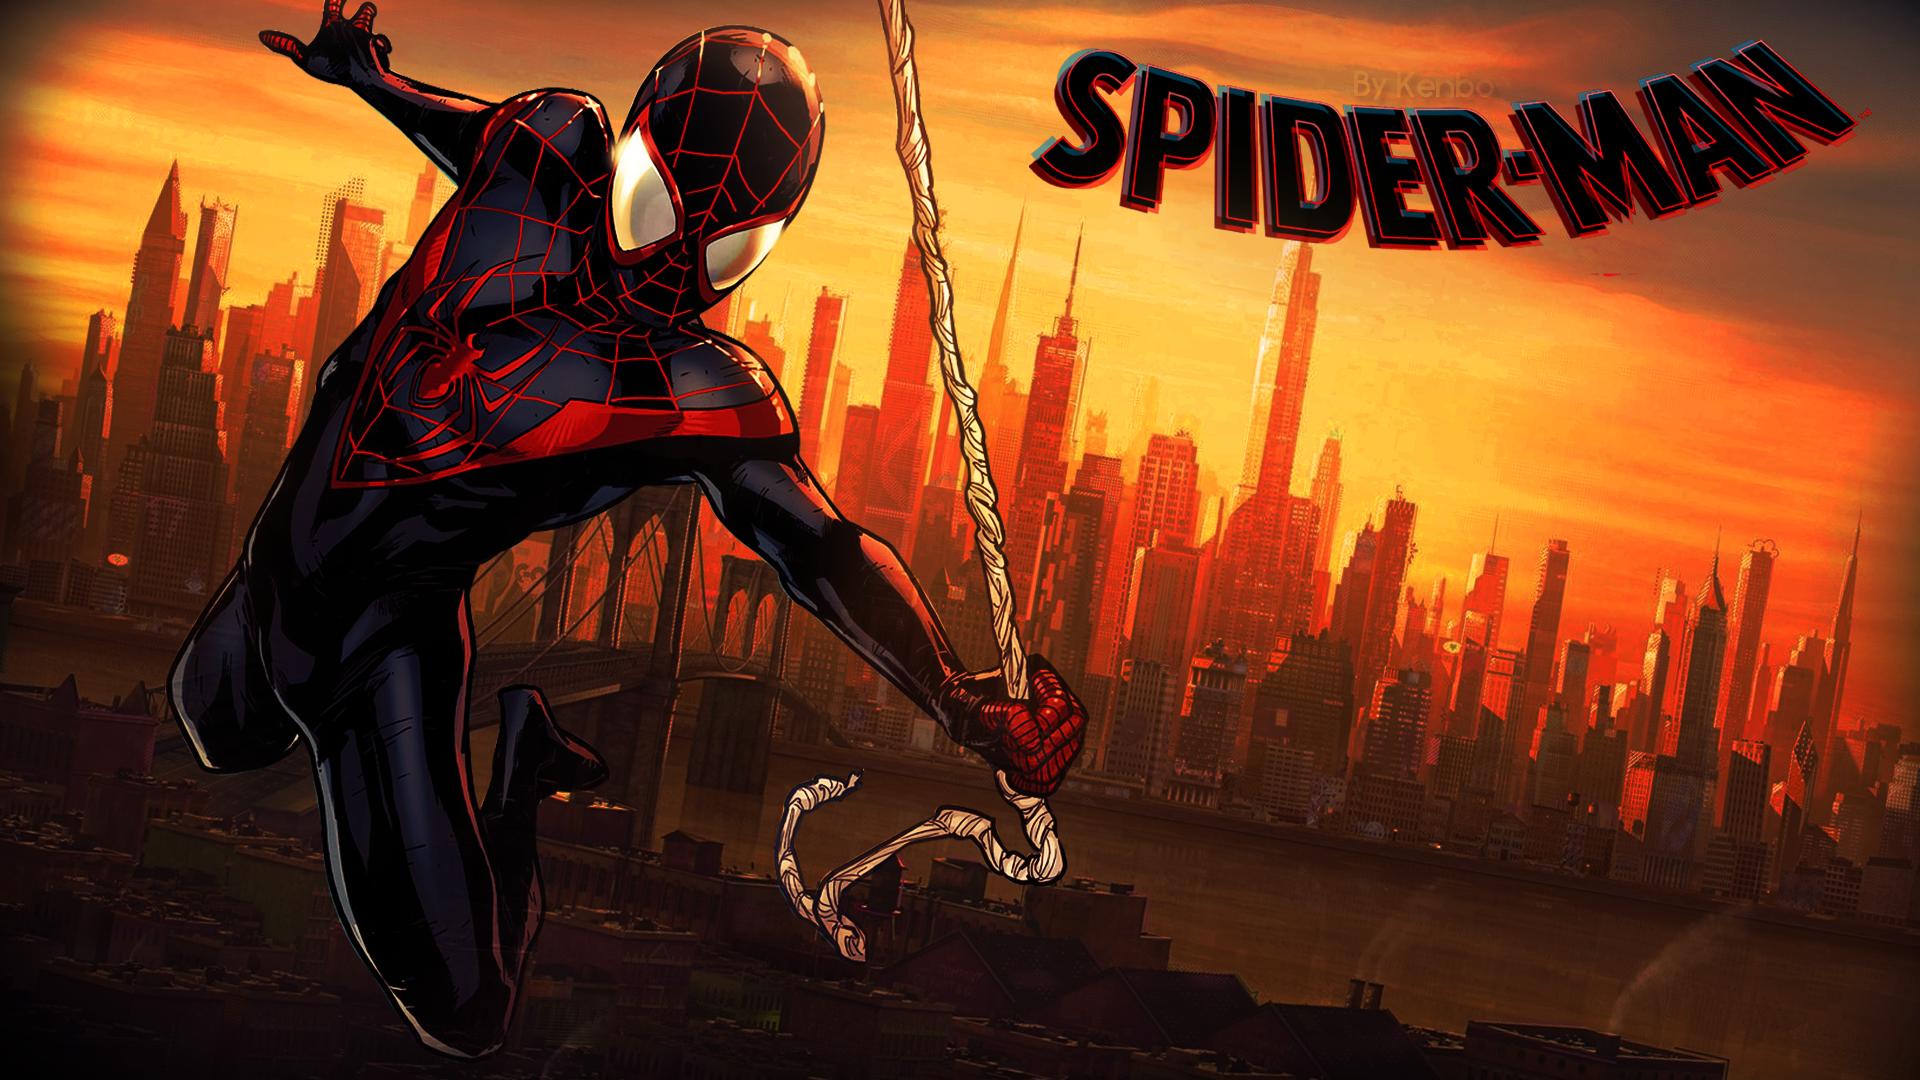 General 1920x1080 spider Spider-Man Black suited Spiderman Marvel Comics comics Miles Morales Spider-Man: Into the Spider-Verse animated movies movies comic books superhero